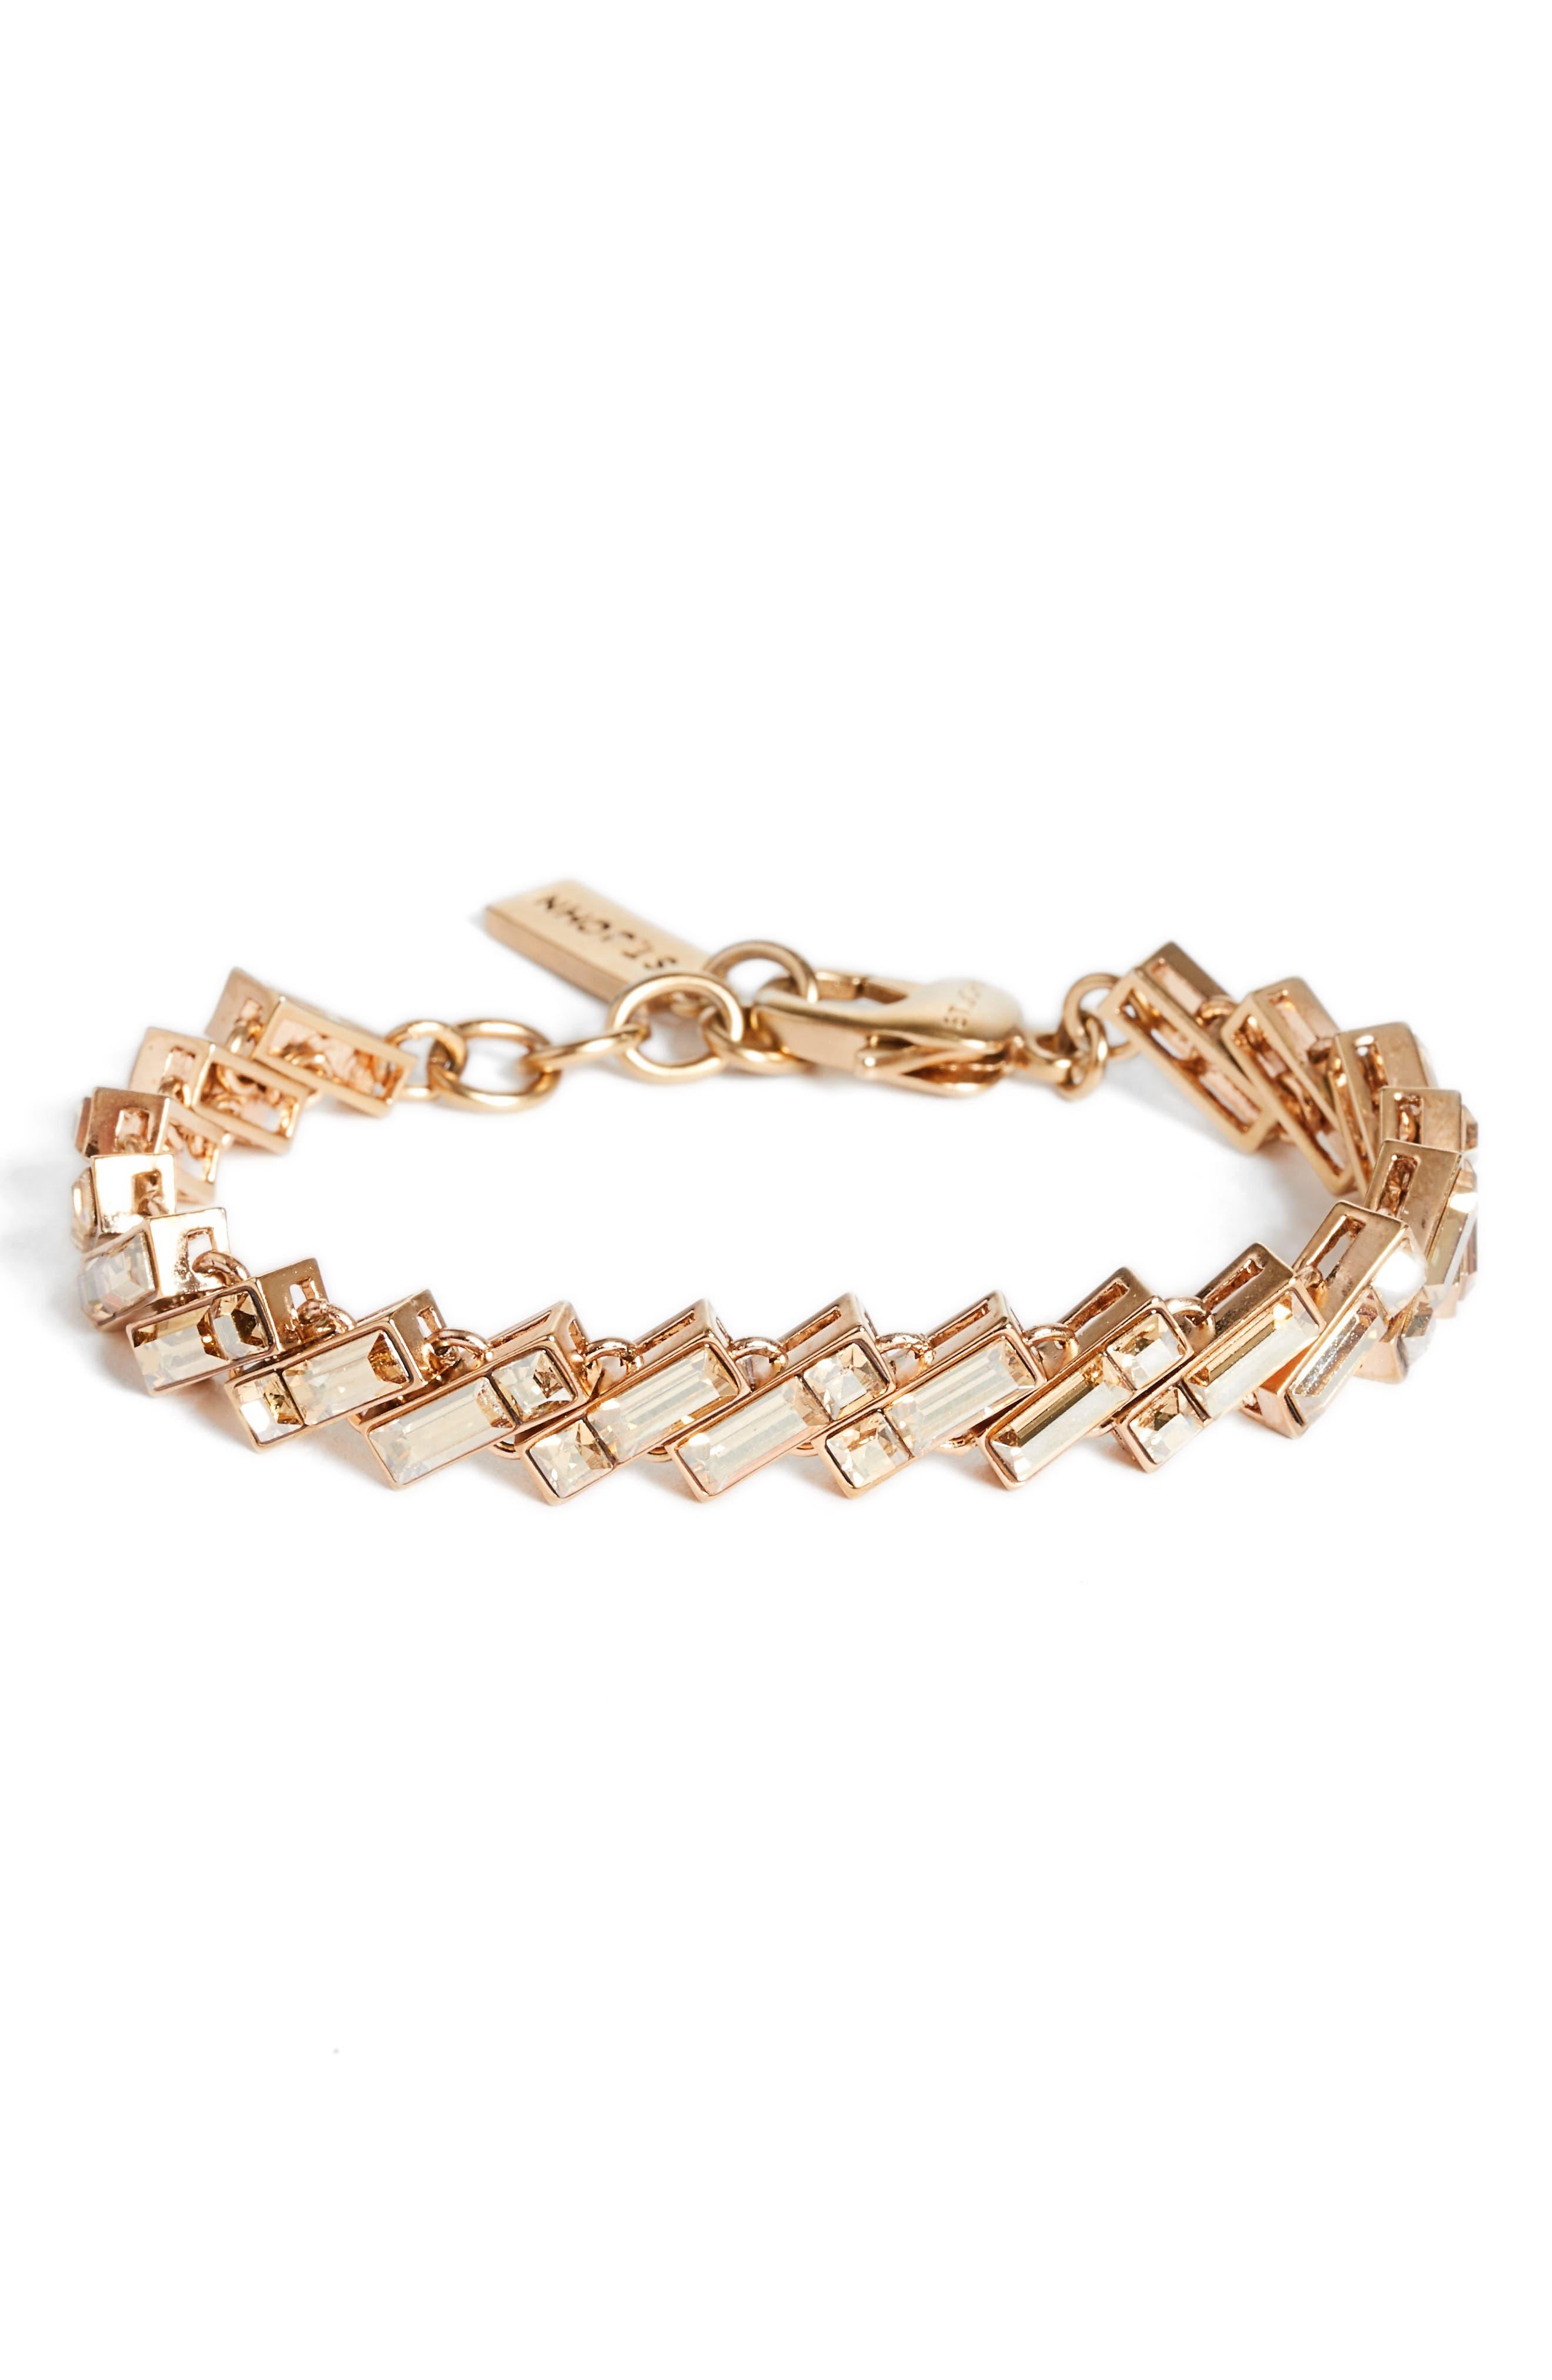 Swarovski Crystal Bracelet,                             Main thumbnail 1, color,                             710